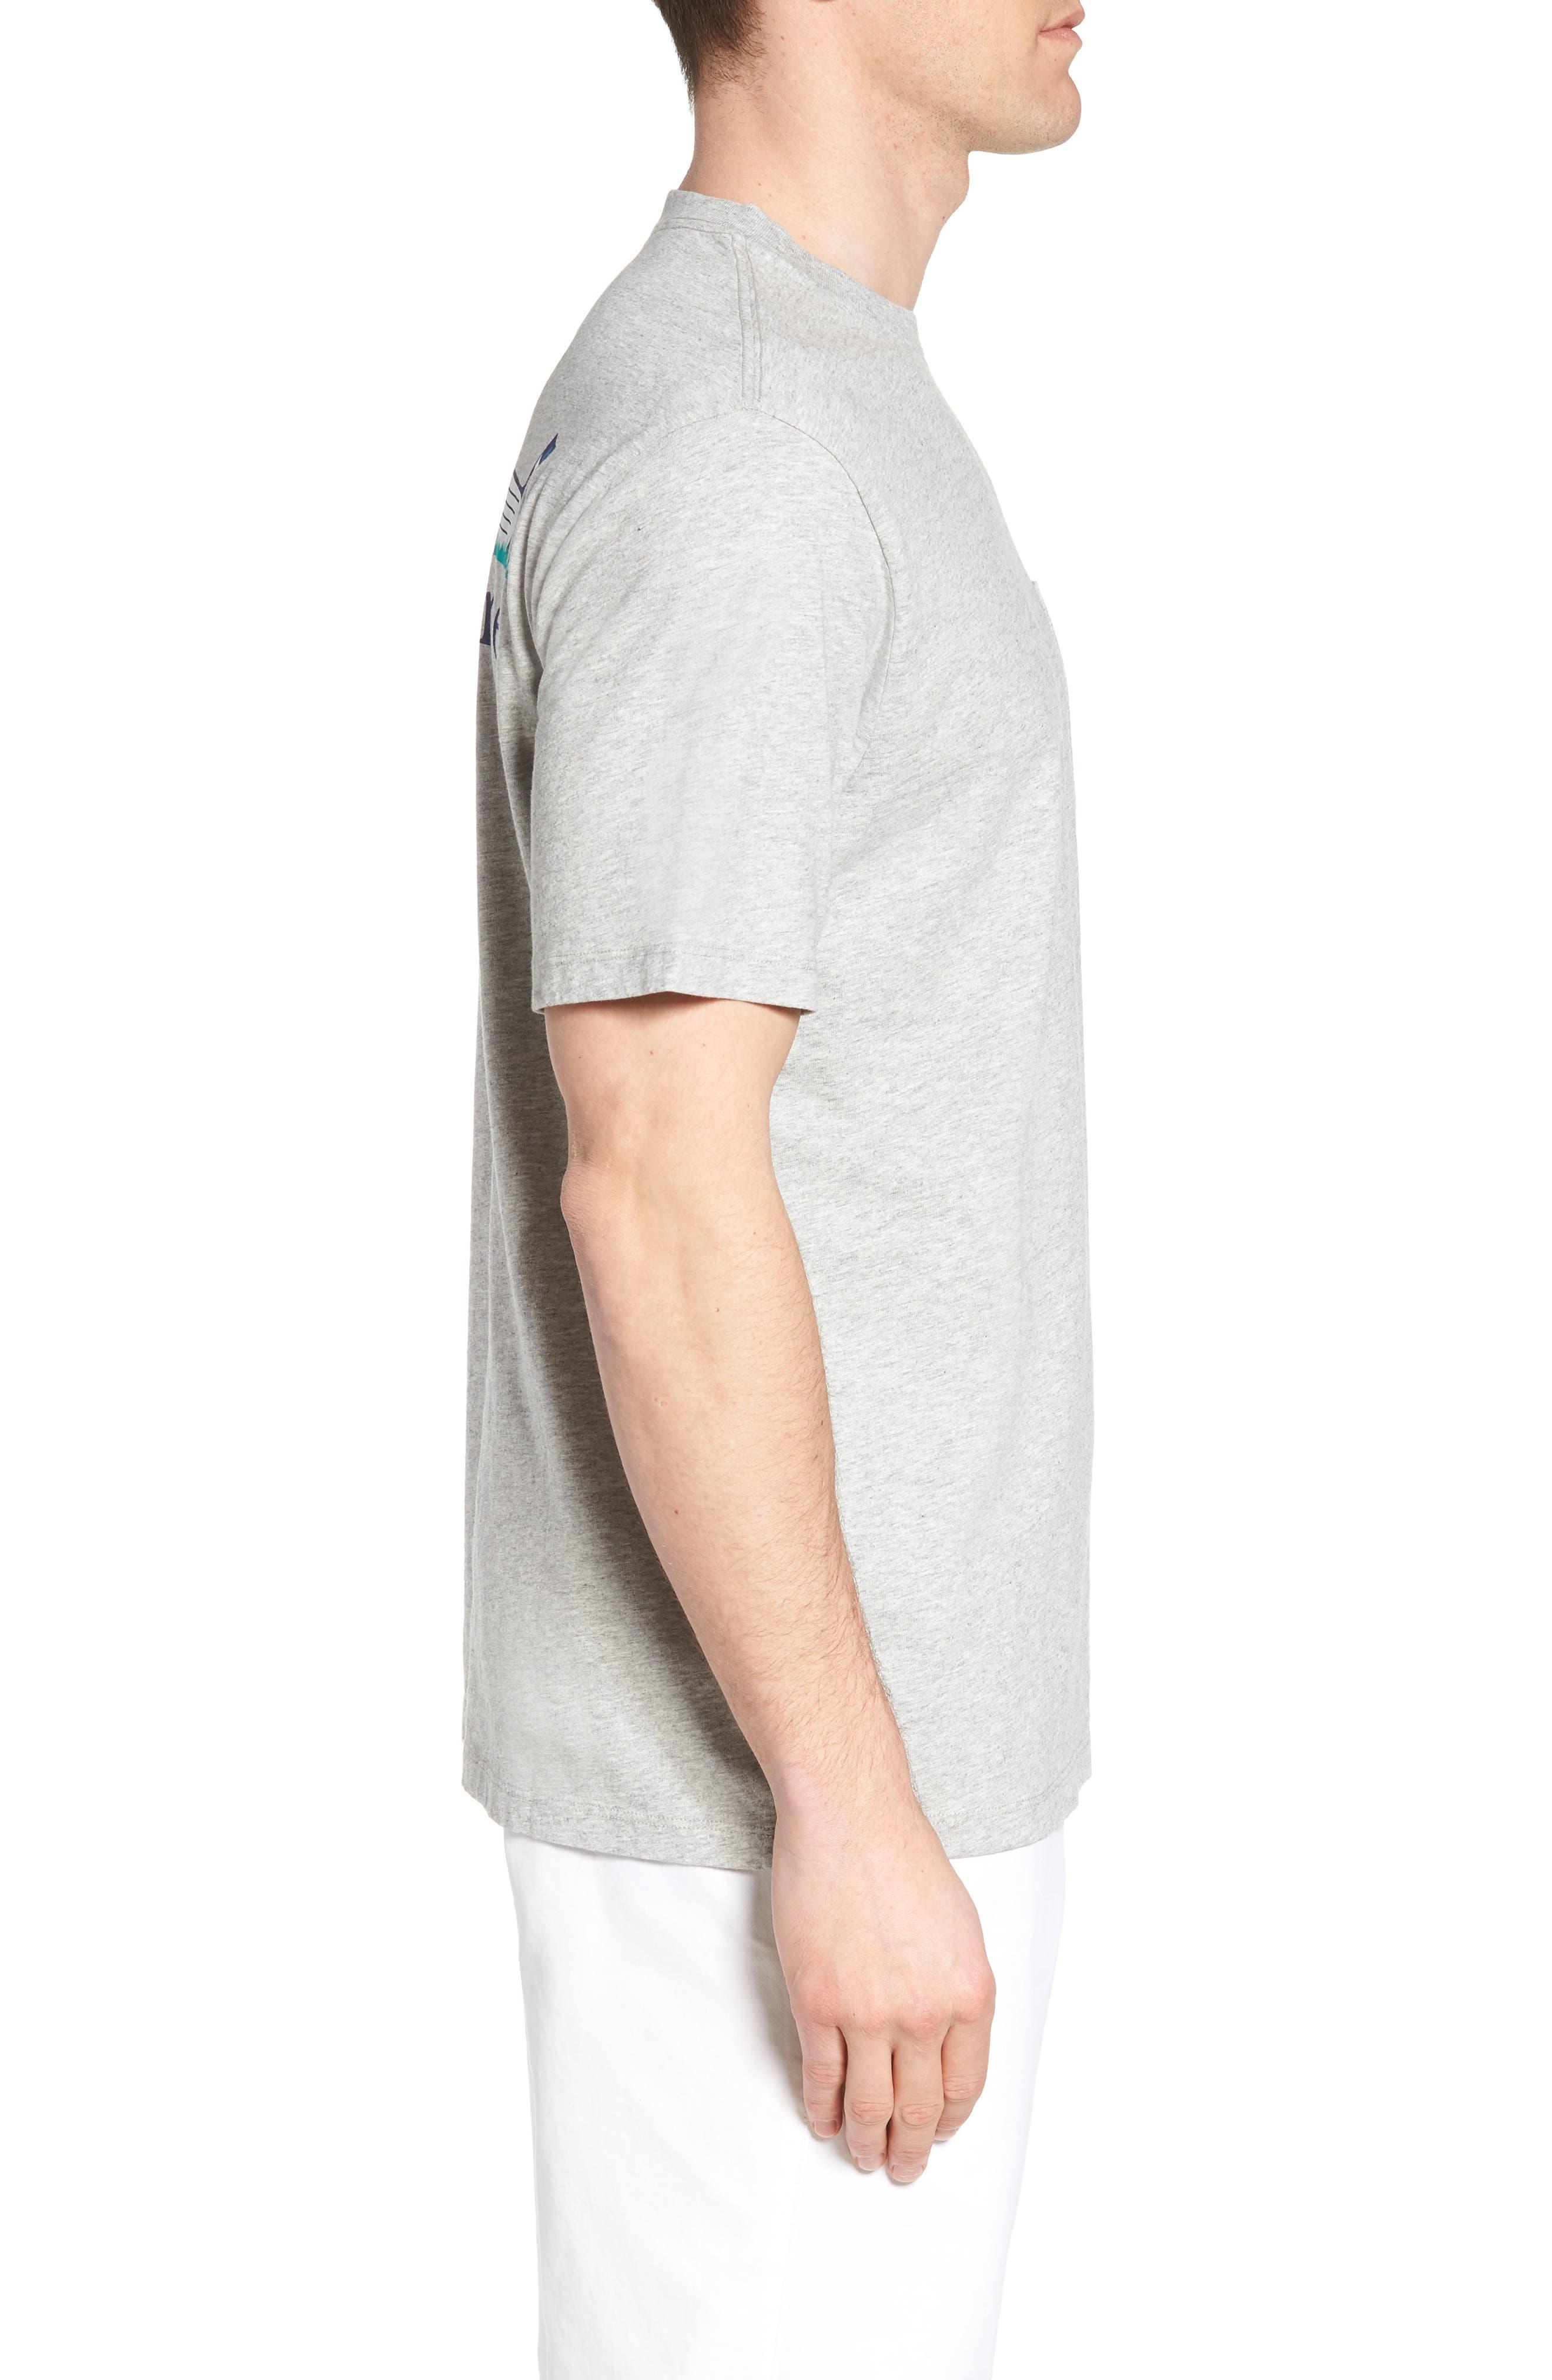 Regular Fit Golf T-Shirt,                             Alternate thumbnail 3, color,                             Gray Heather